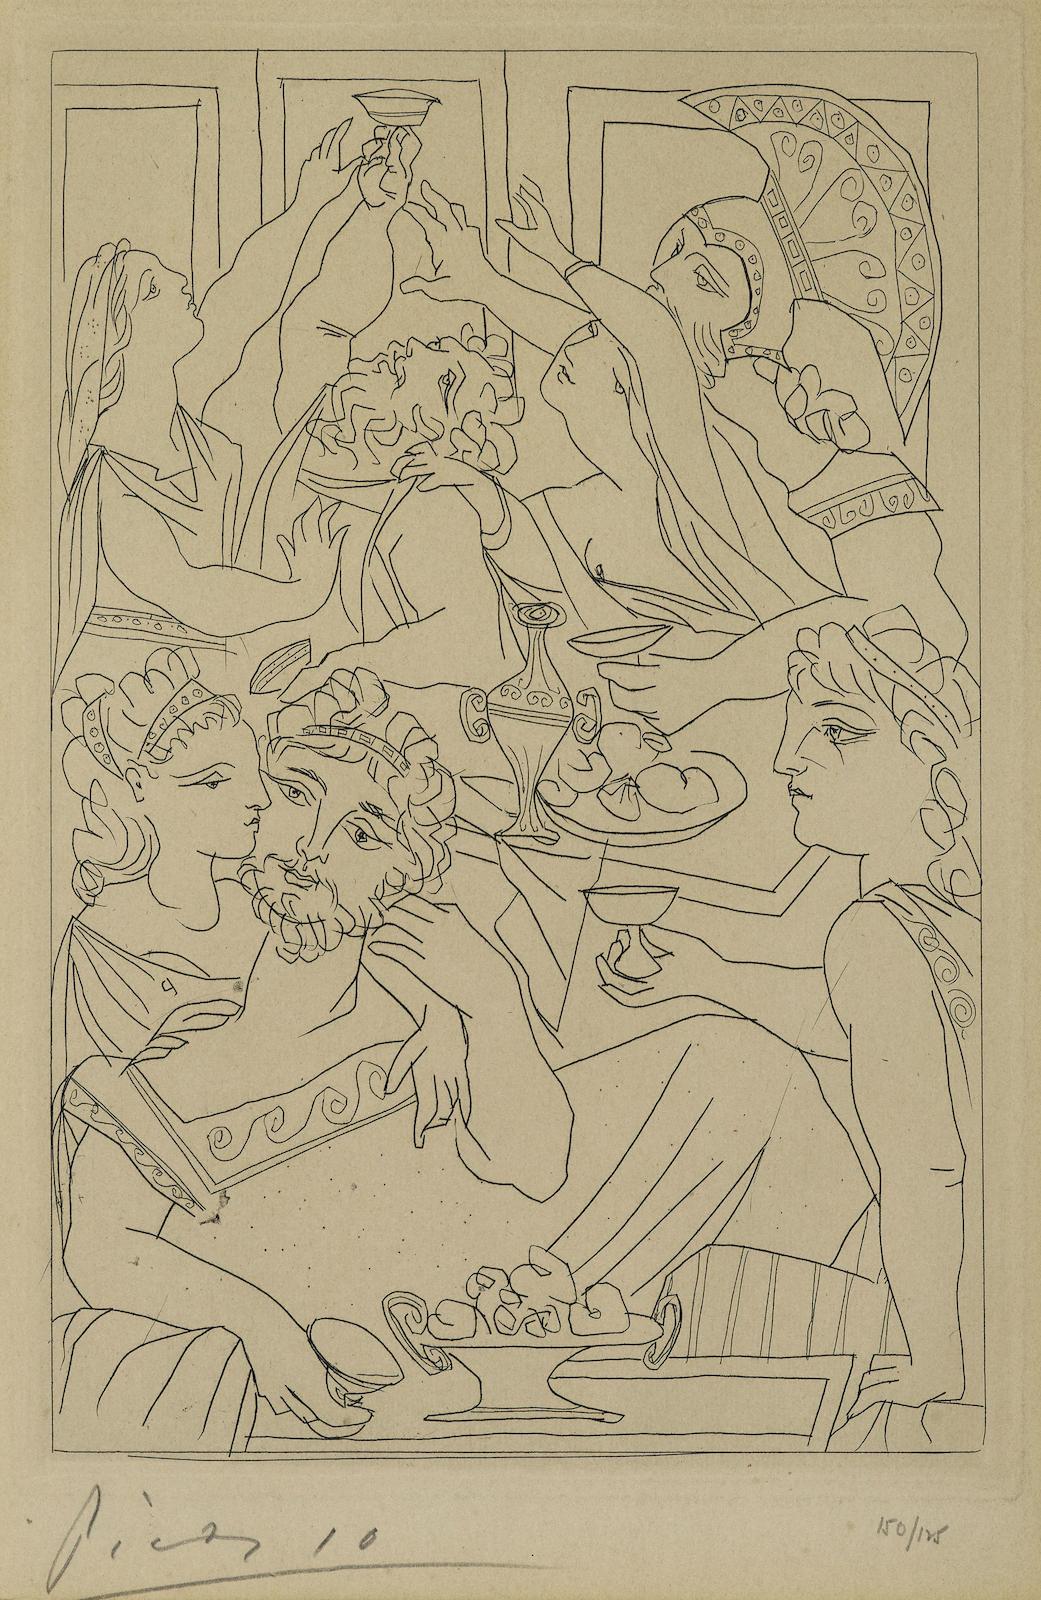 Pablo Picasso-Le Festin, pl. 6, from Lysistrata (B. 272; Ba. 392; C. bk. 24)-1934